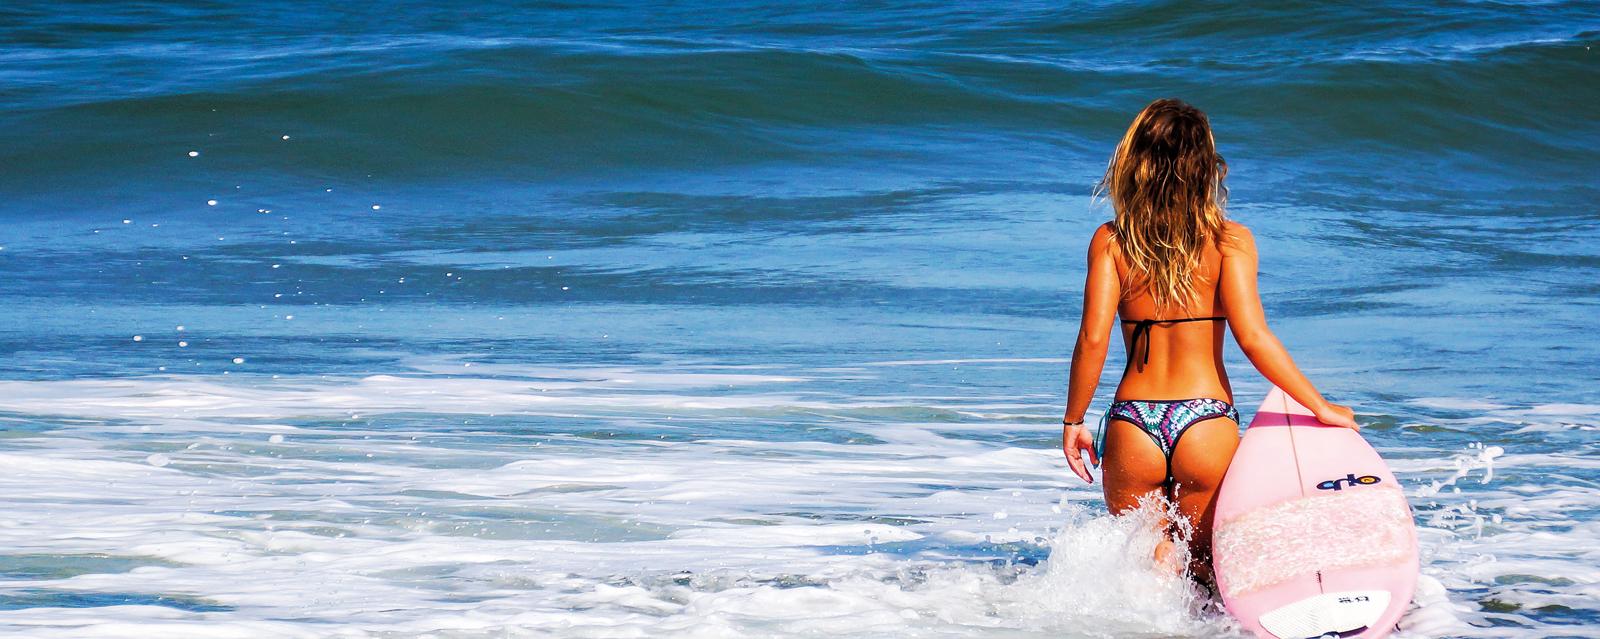 Surfuj 2 roky zadarmo